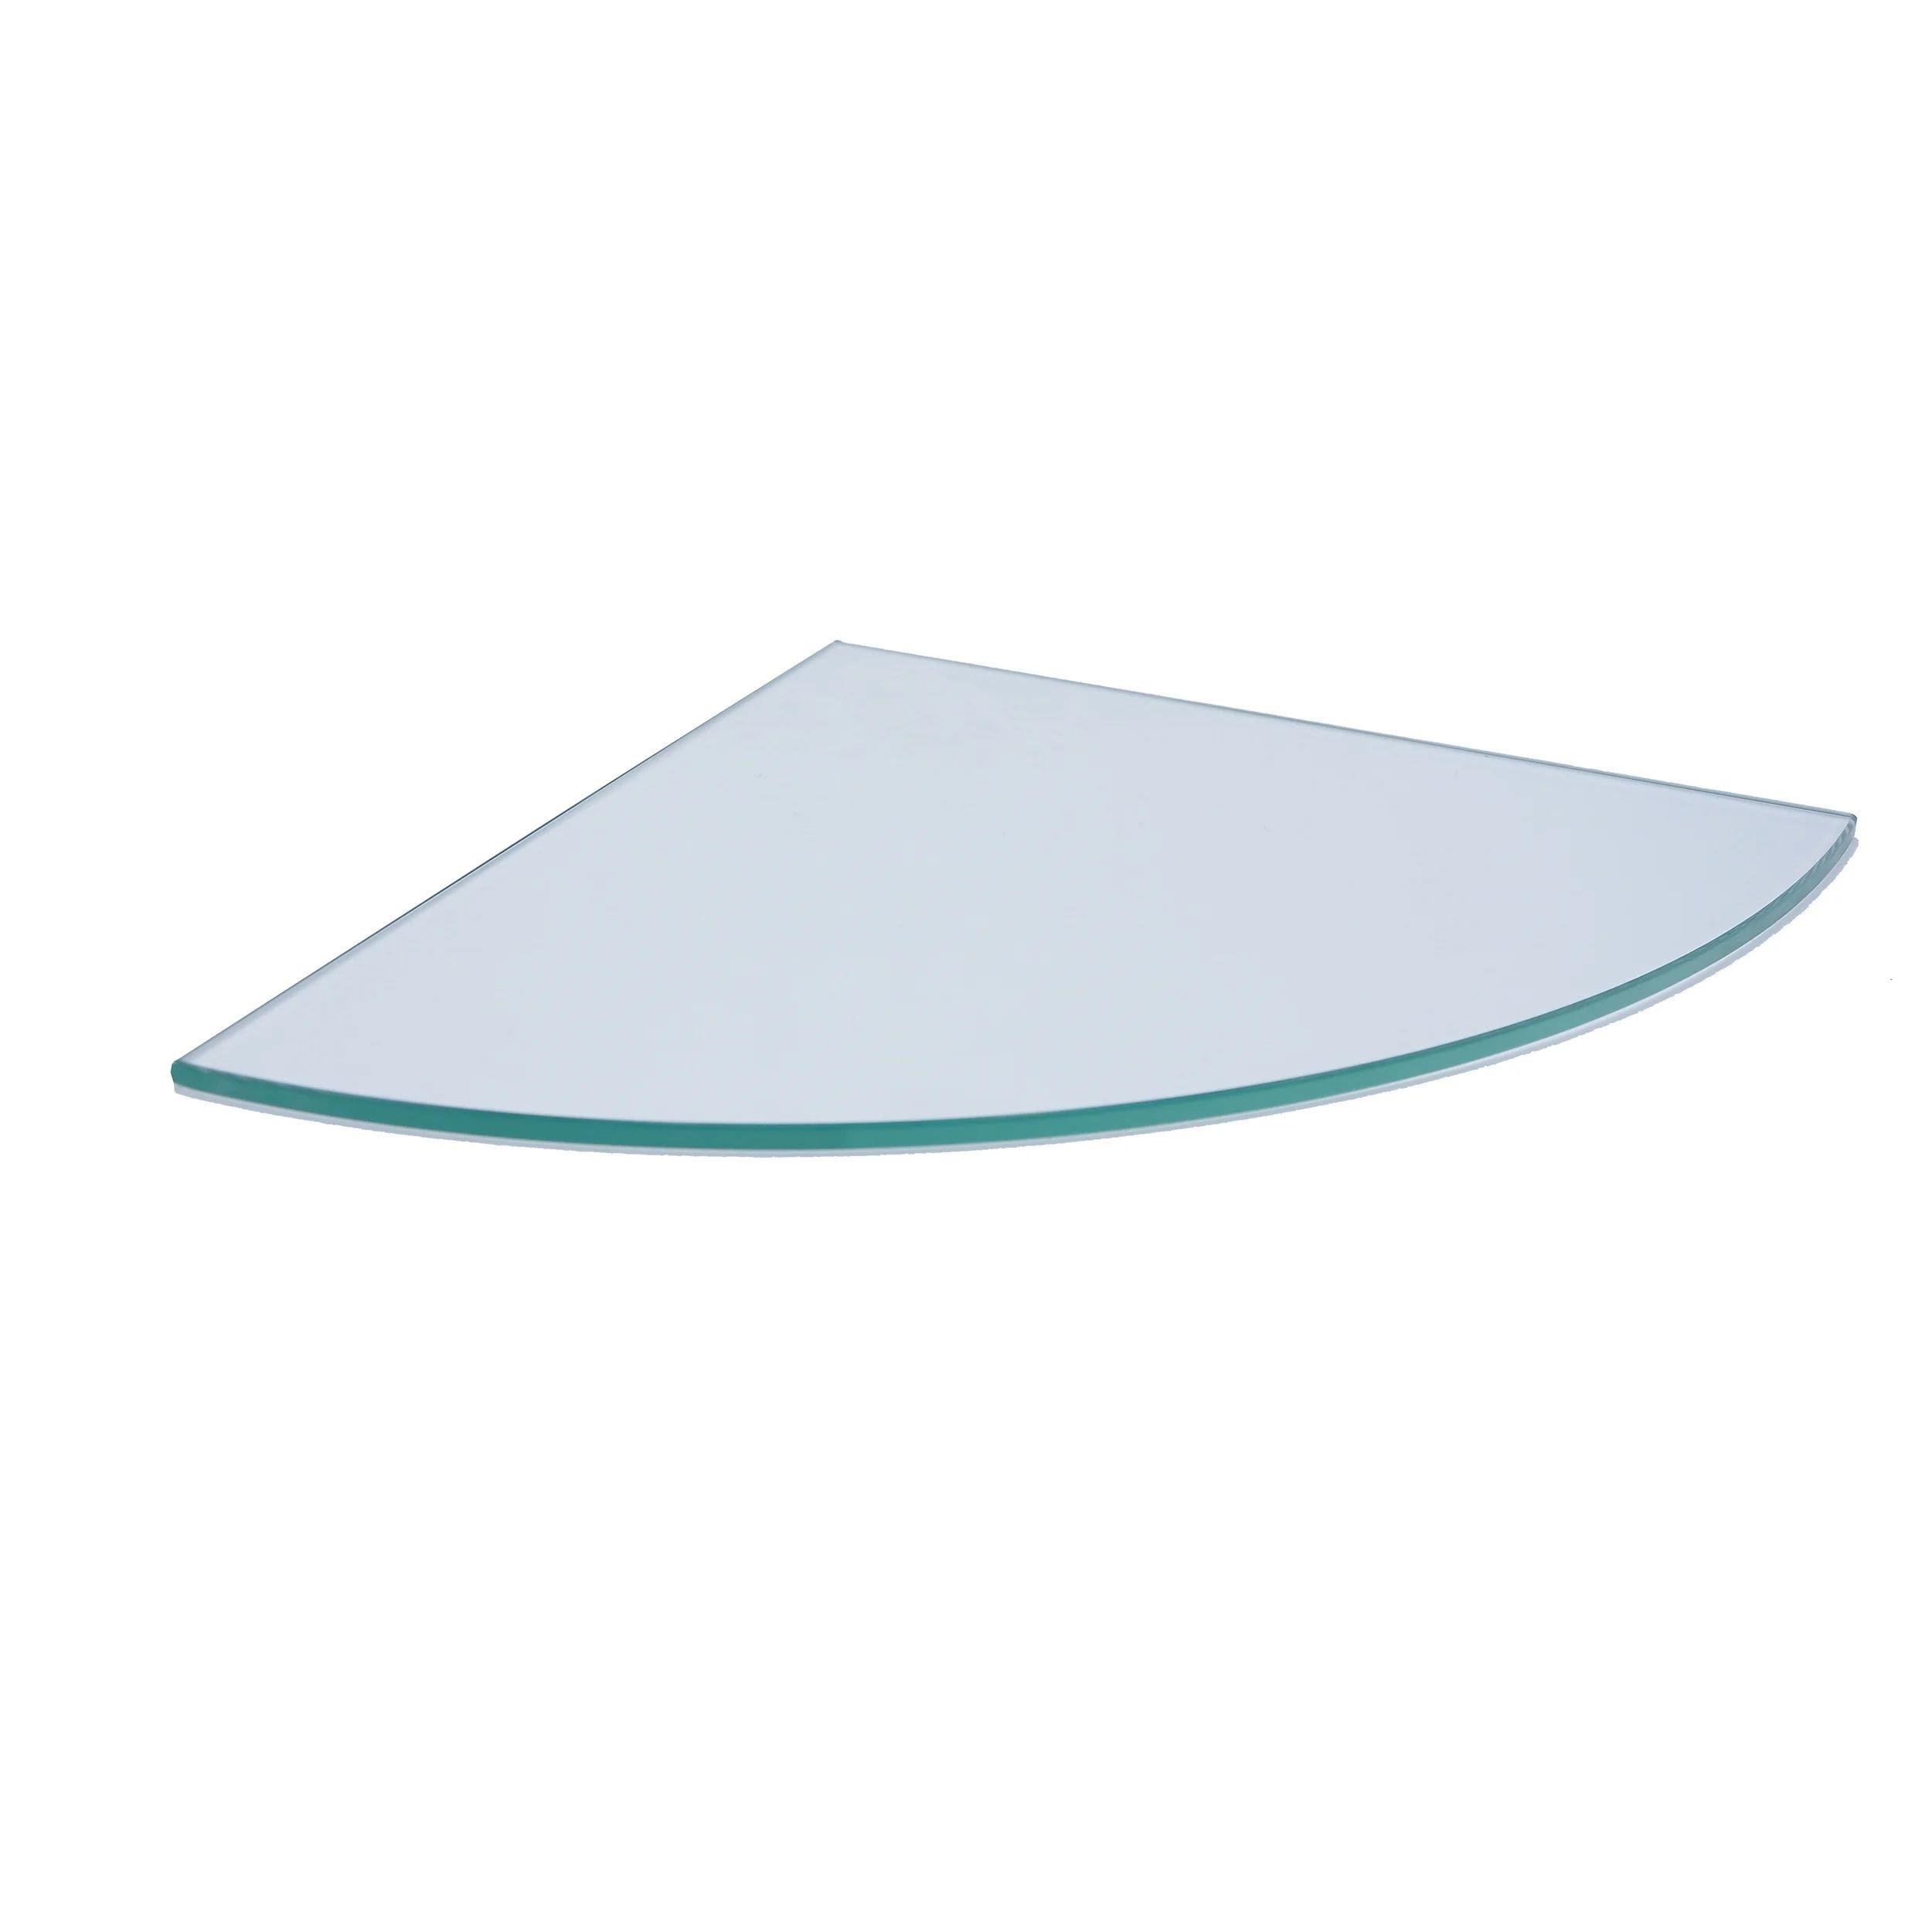 Tablette Verre D Angle L 26 Cm Modul Leroy Merlin